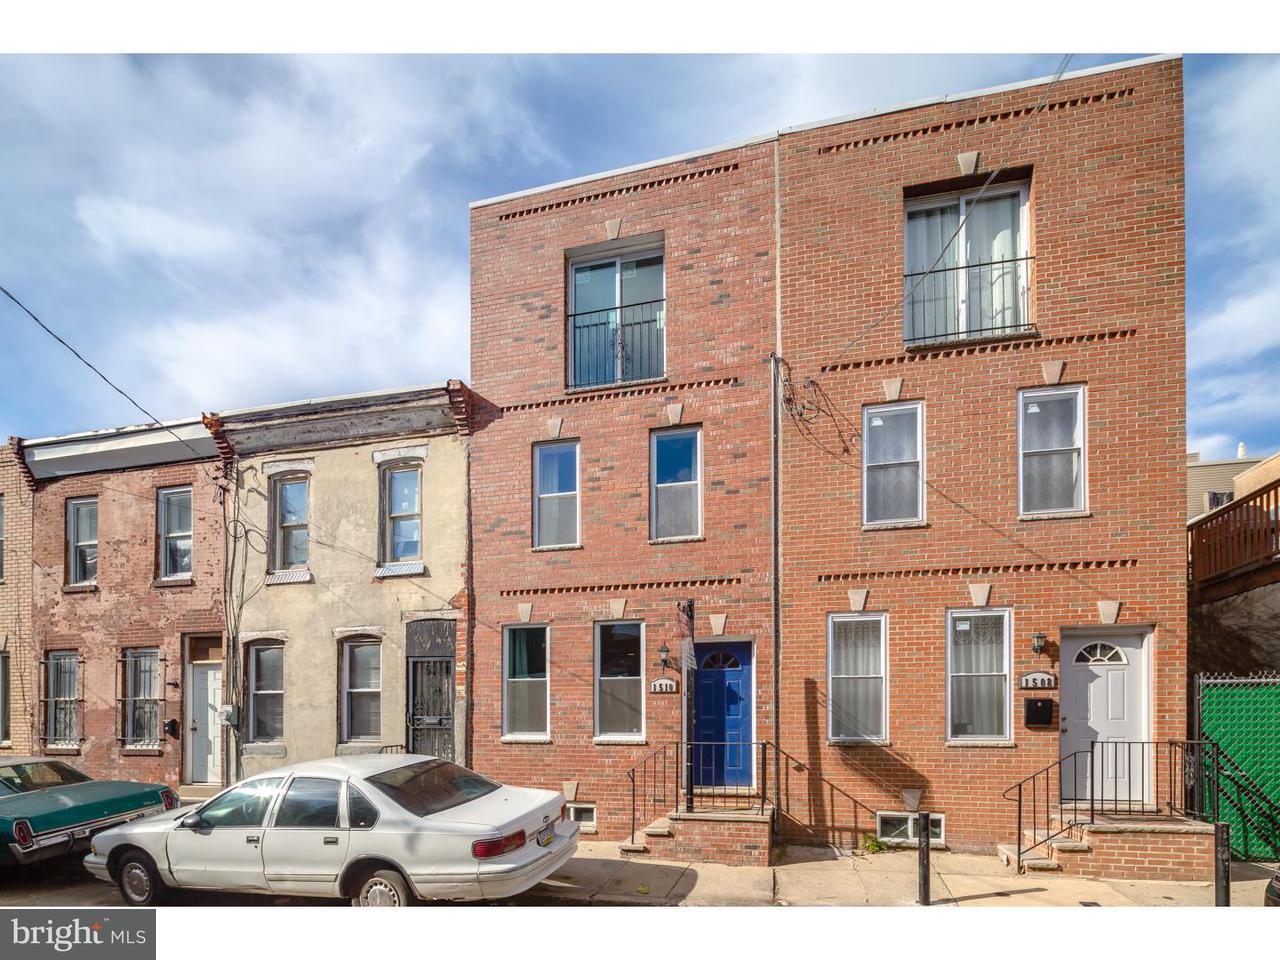 1510 S Bouvier Philadelphia , PA 19146